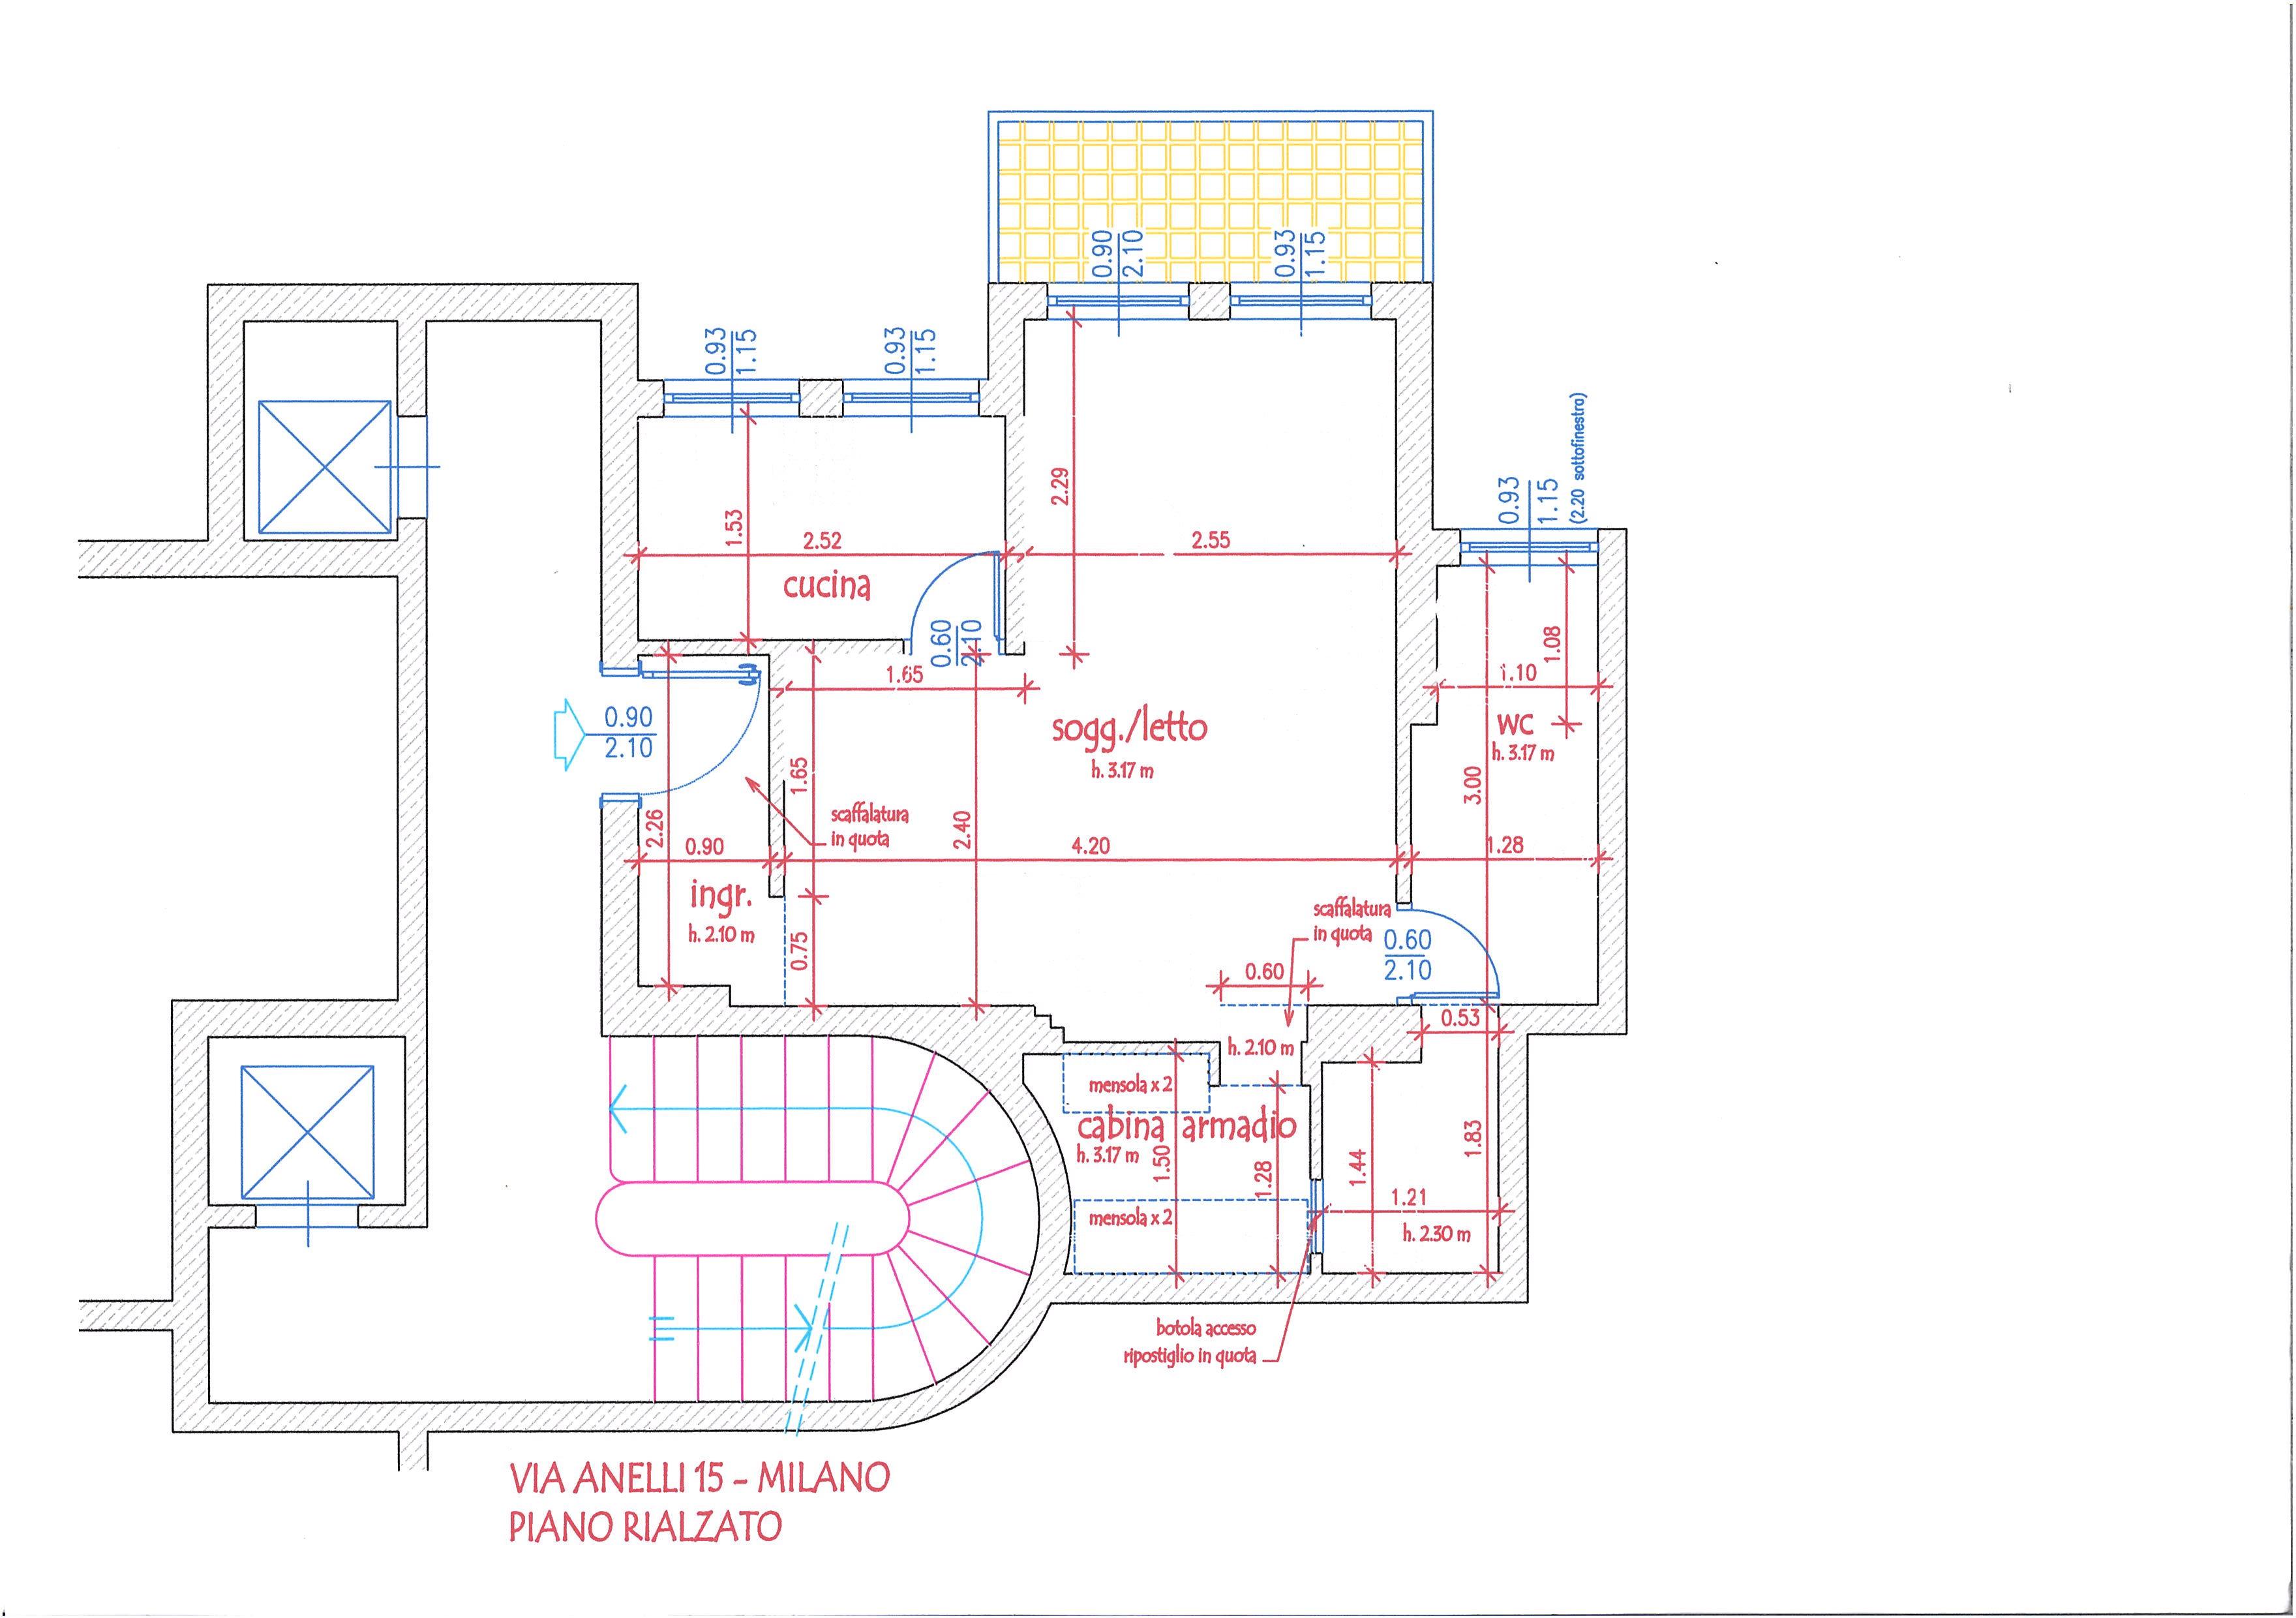 planimetrie/kAGgPbyKOj.jpg